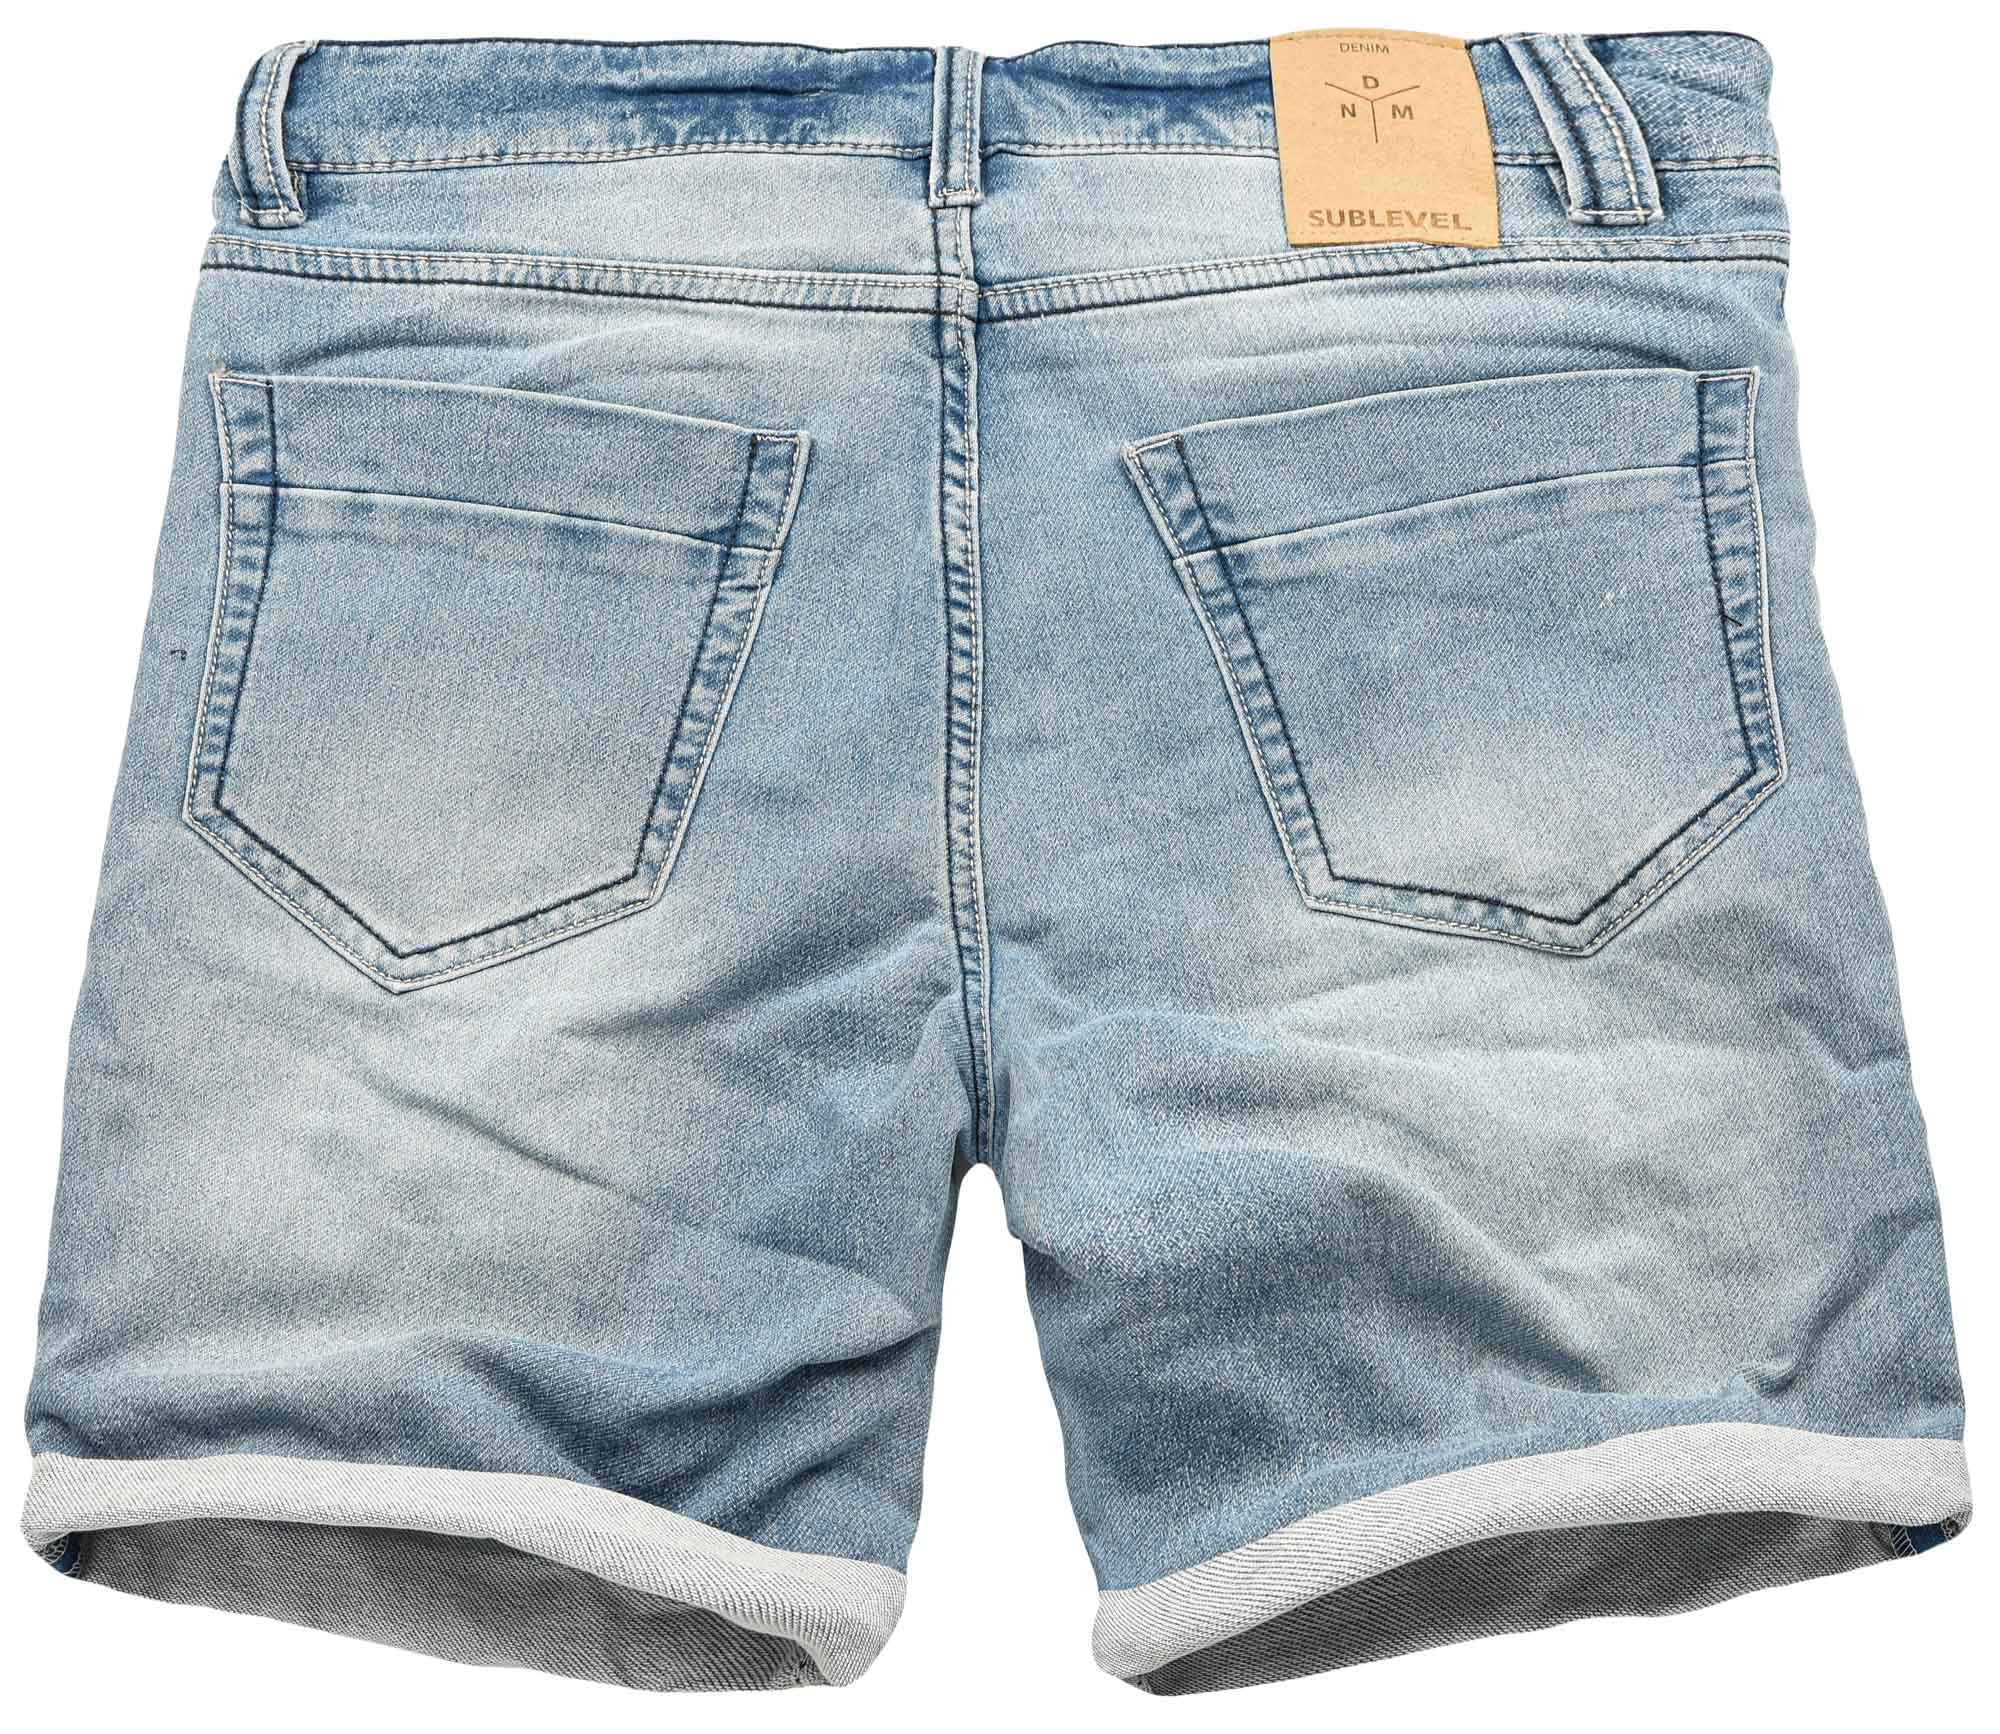 Sublevel-Herren-Sweat-Jeans-Shorts-kurze-Hose-Bermuda-Sommer-Sweathose-Slim-NEU Indexbild 18